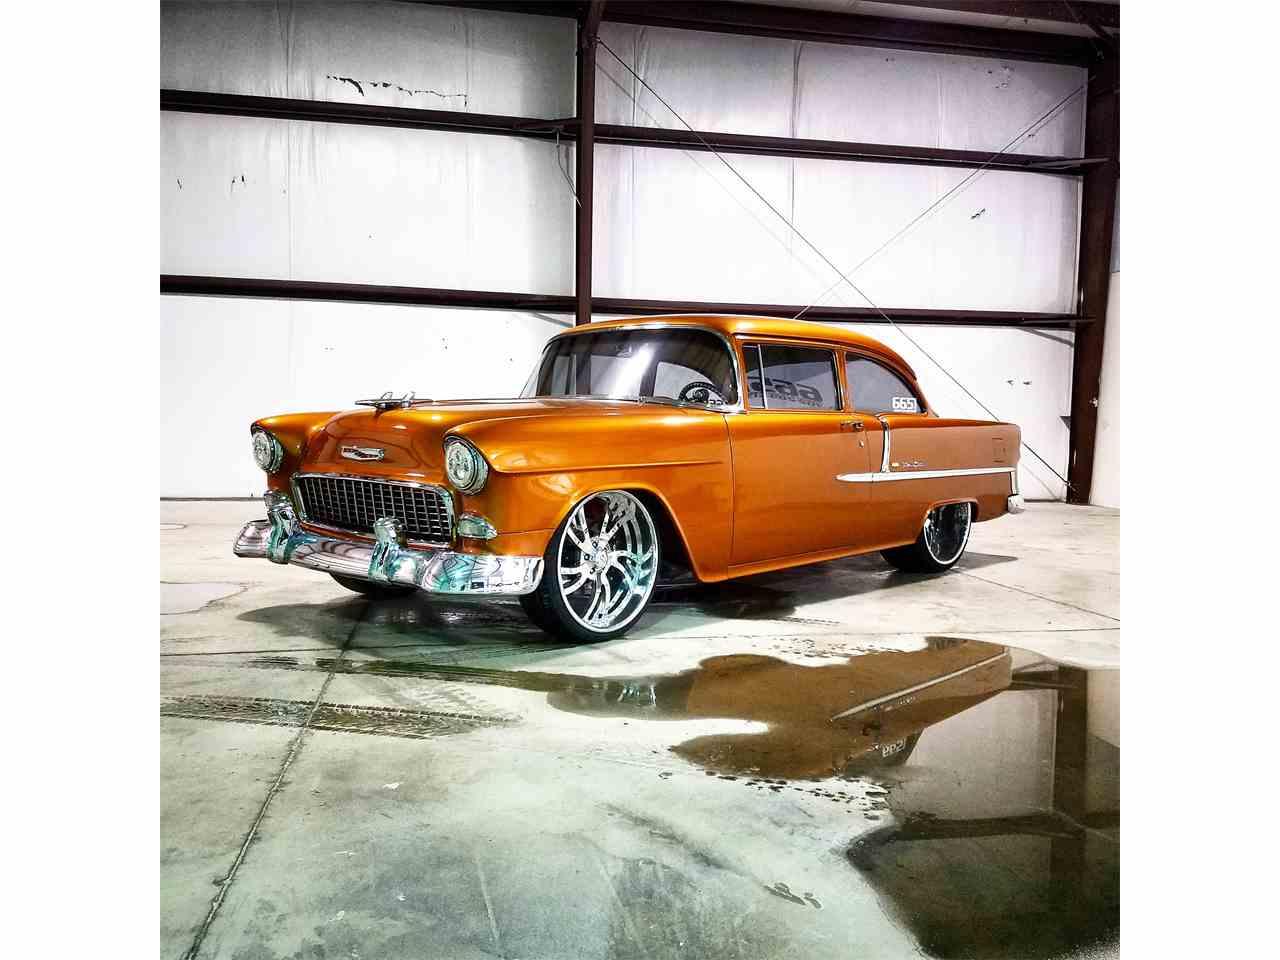 1955 Chevrolet Bel Air for Sale | ClassicCars.com | CC-922602